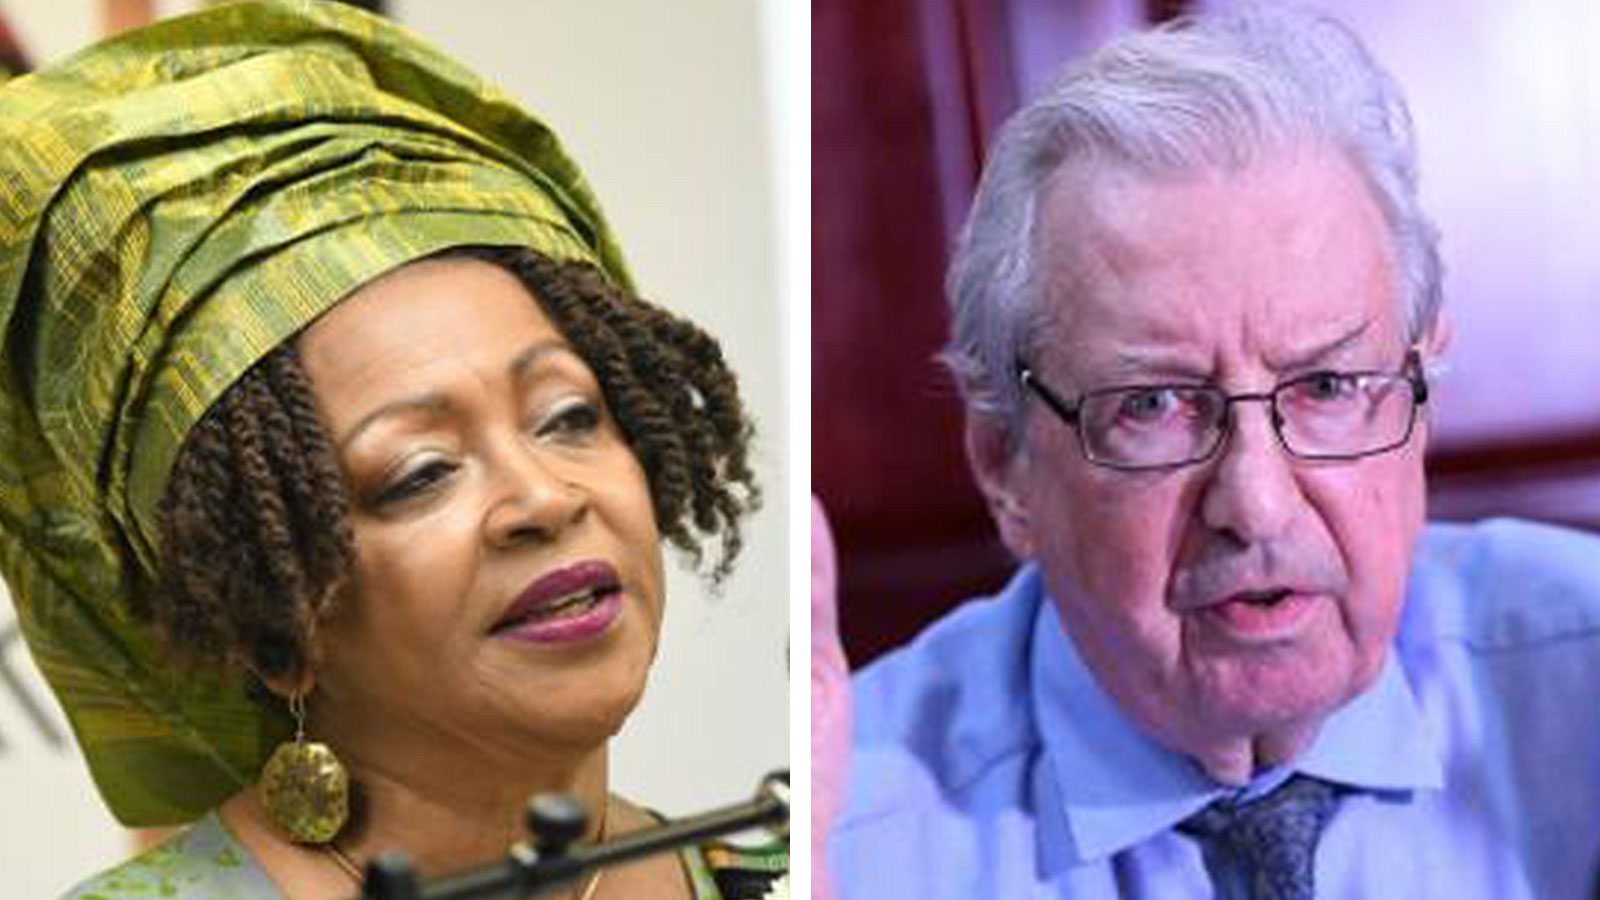 Professor Verene Shepherd and British-Jamaican Lord Anthony Gifford